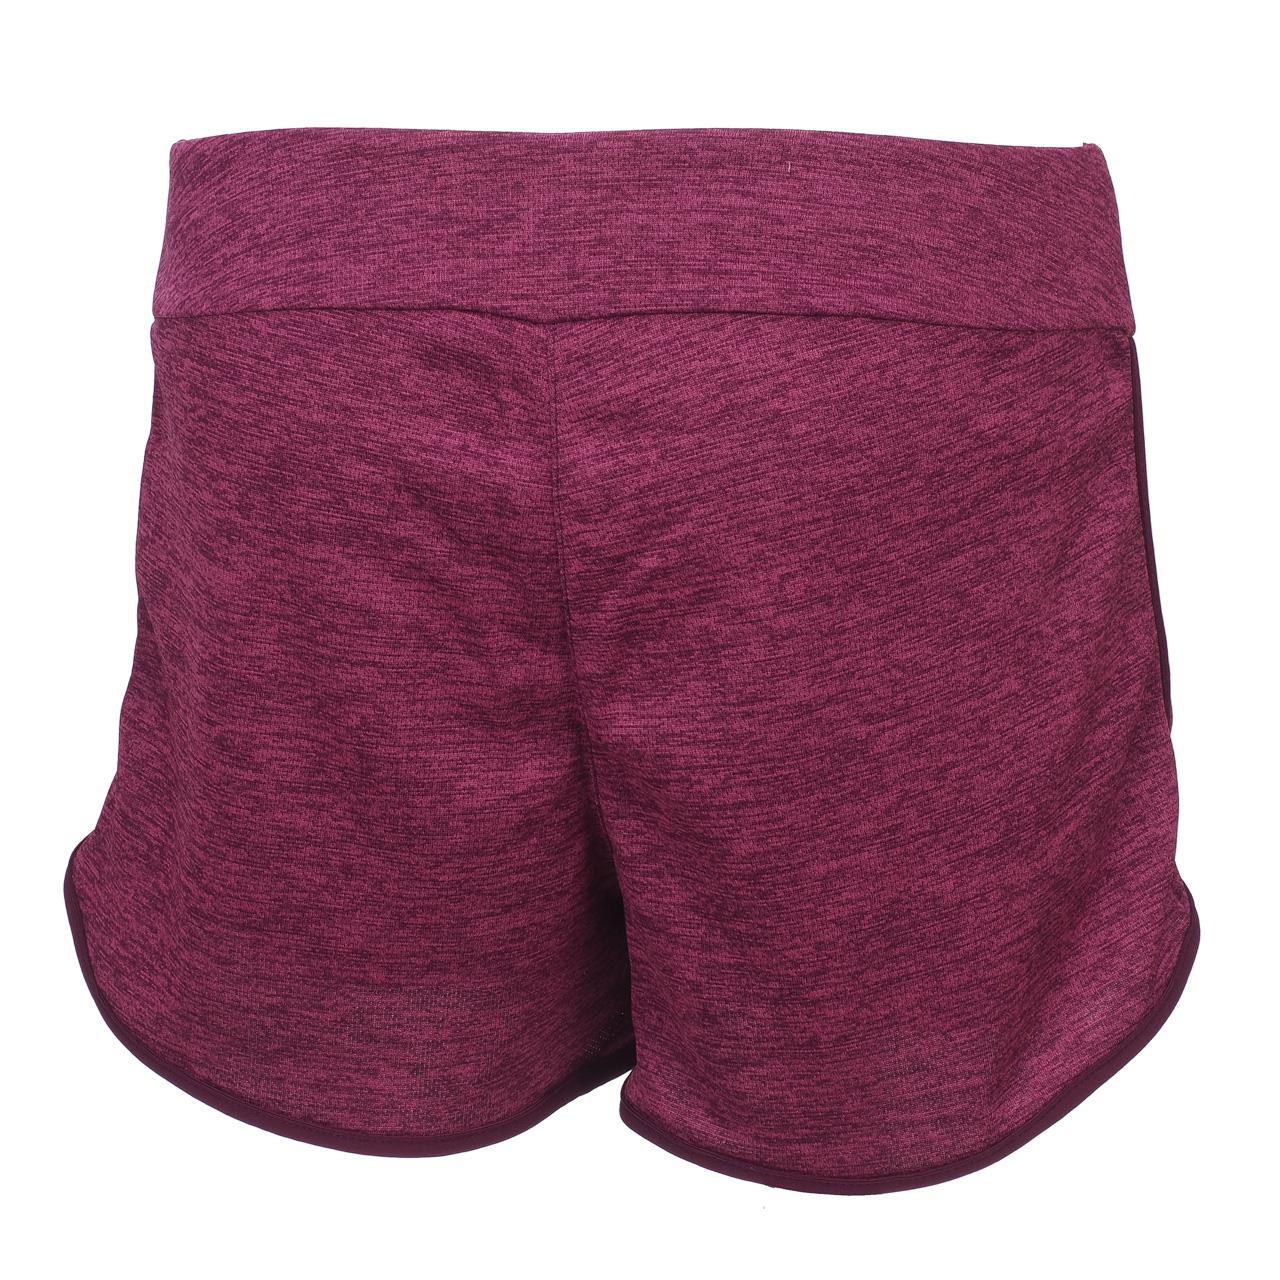 short-Tennis-Wilson-G-Core-3-5-Shorts-Maedchen-Lila-90184-Neu Indexbild 4